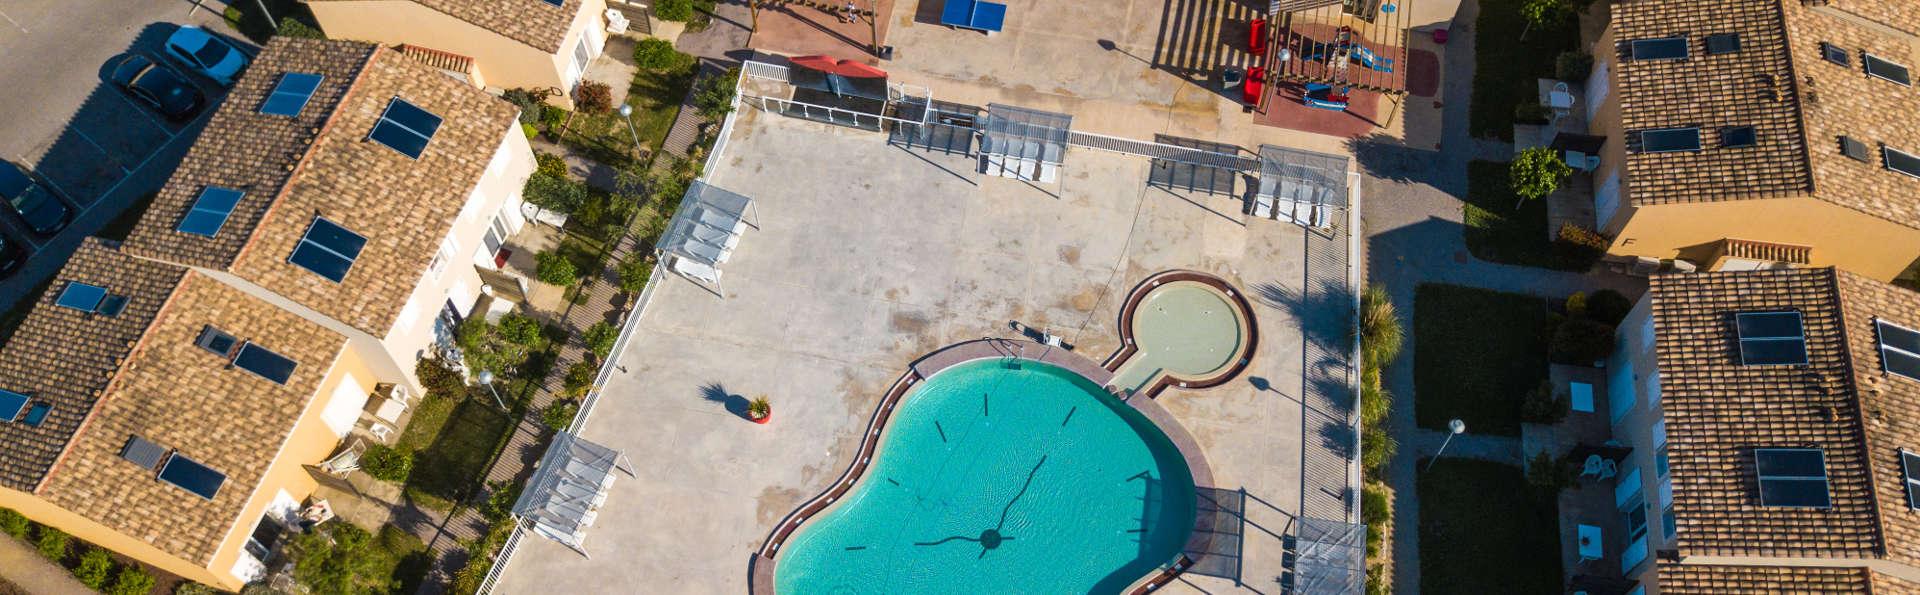 Vacanceole Demeures Torellanes St Cyprien - EDIT_NEW_View.JPG